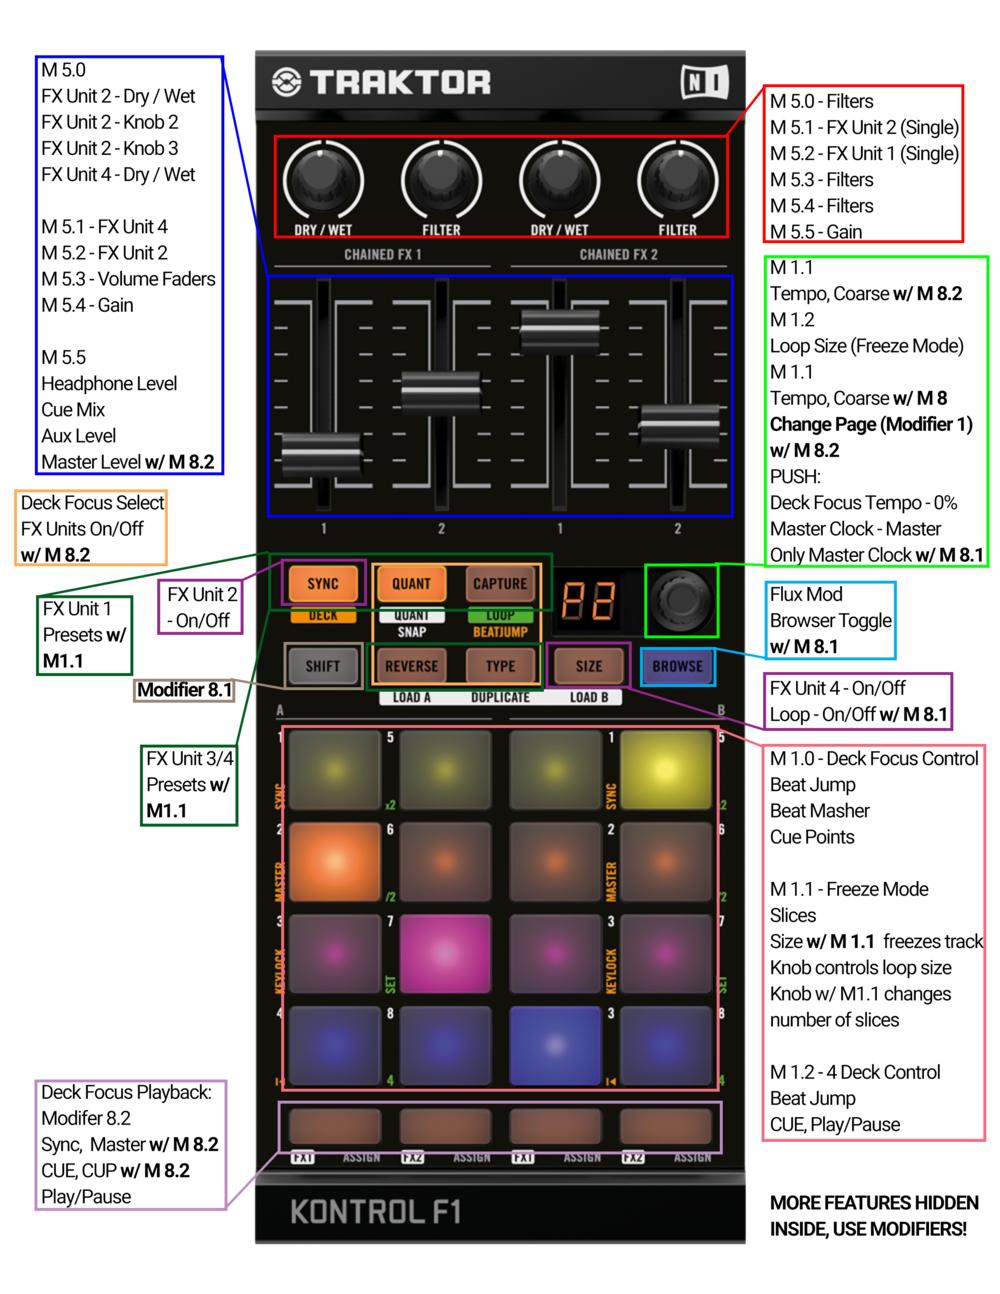 AK Native Instruments Kontrol F1 Traktor 3 Mapping 1.0